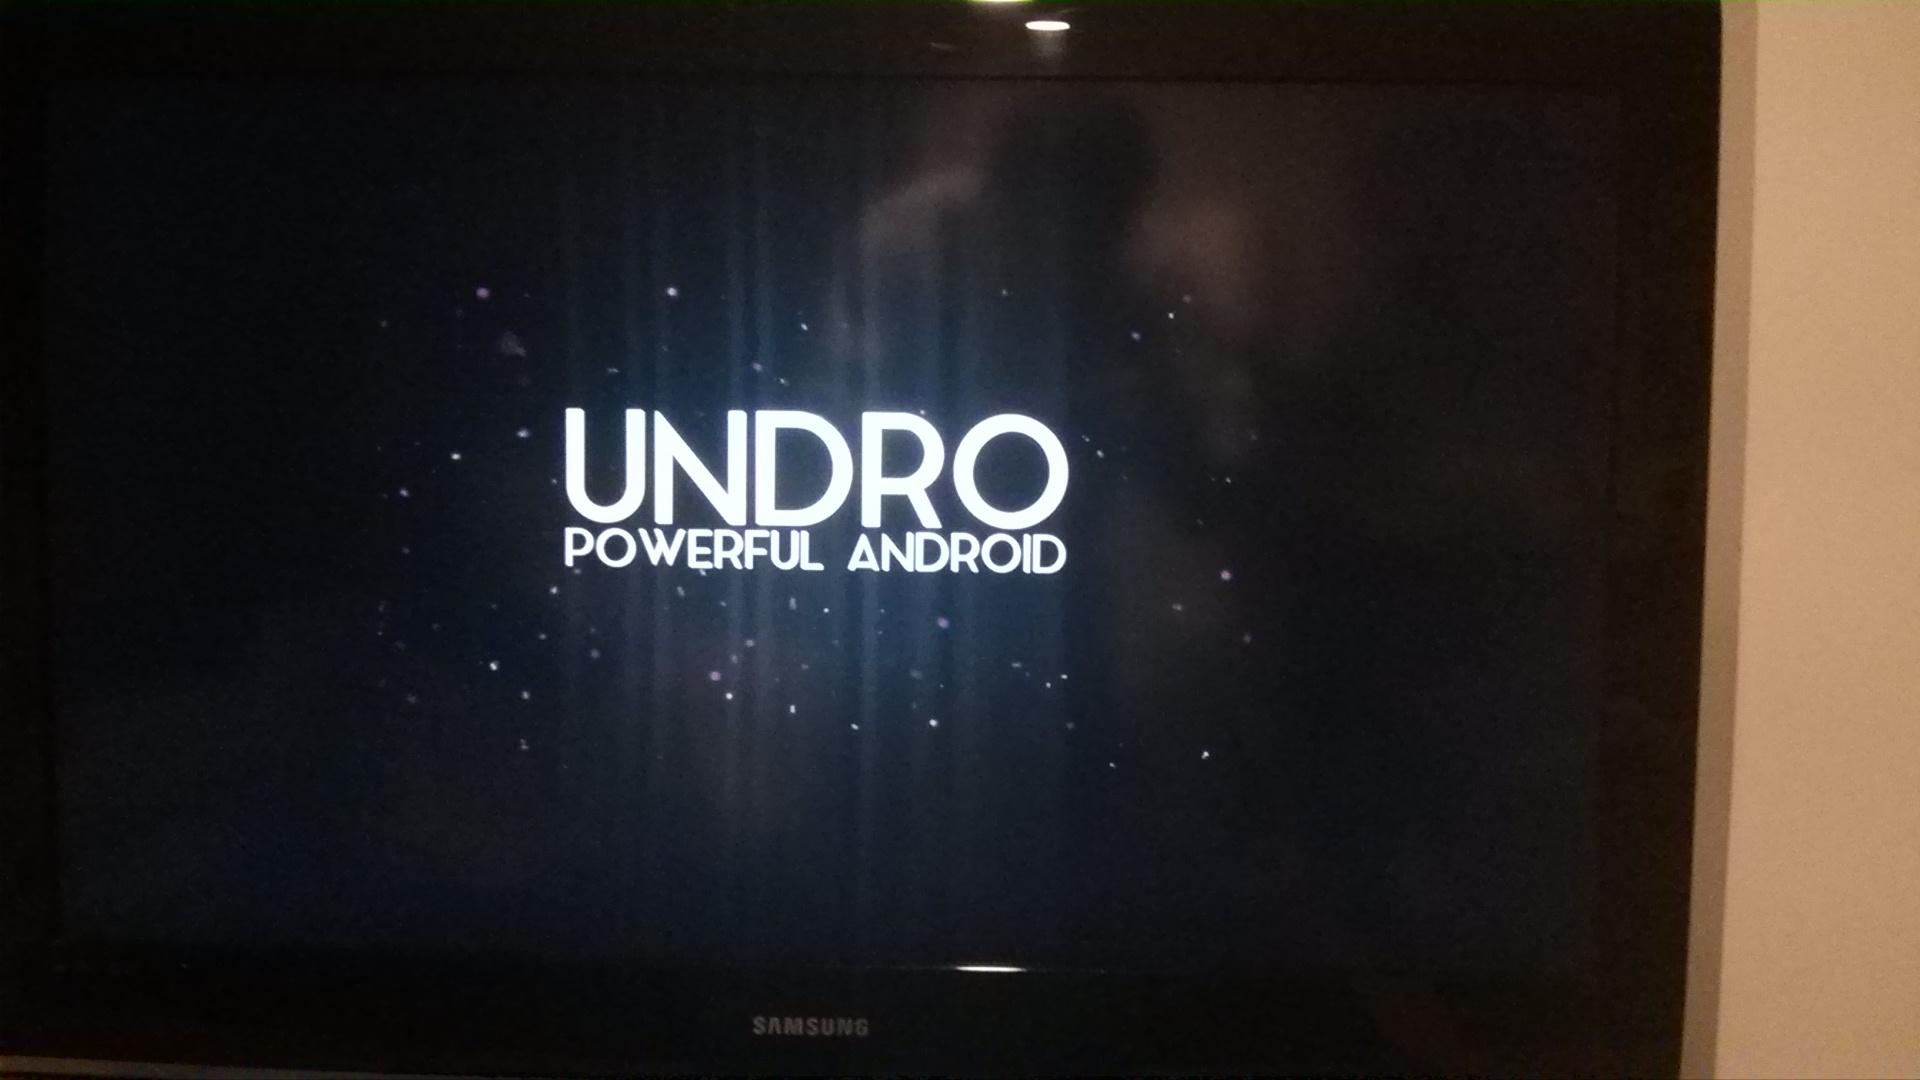 # Undro - Mi experiencia... OK!-https://farm8.staticflickr.com/7646/16780981522_0972af0752_o.jpg